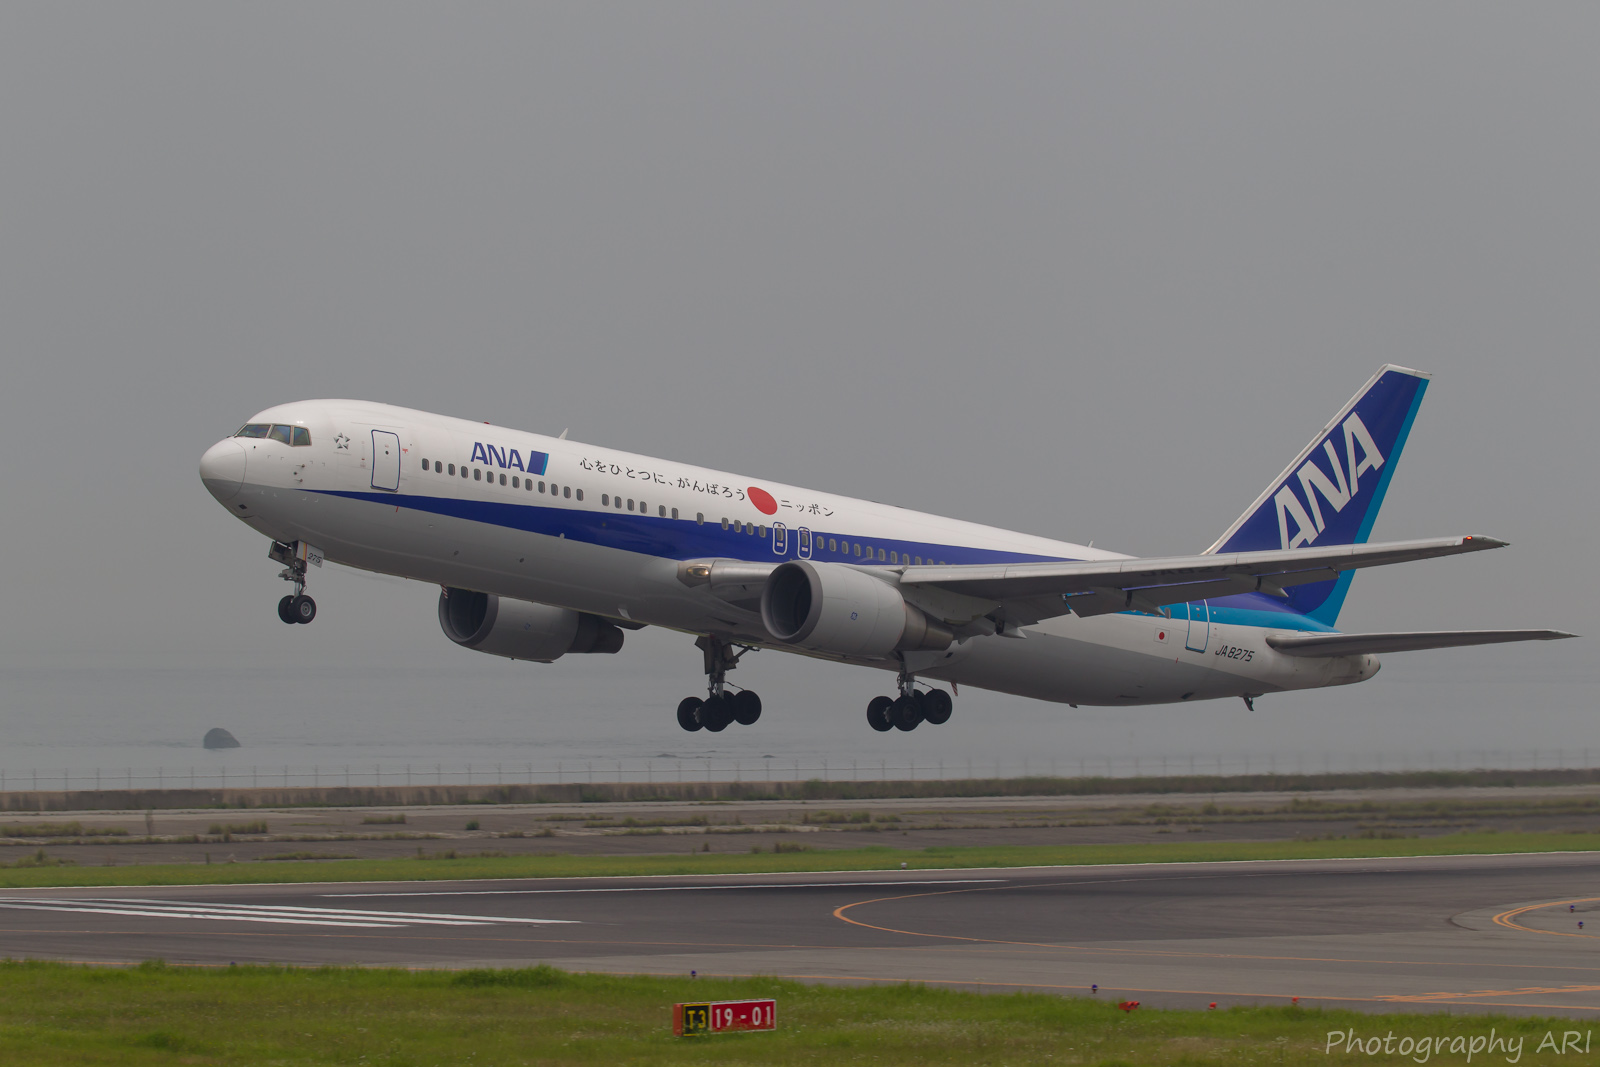 ANA B767-300